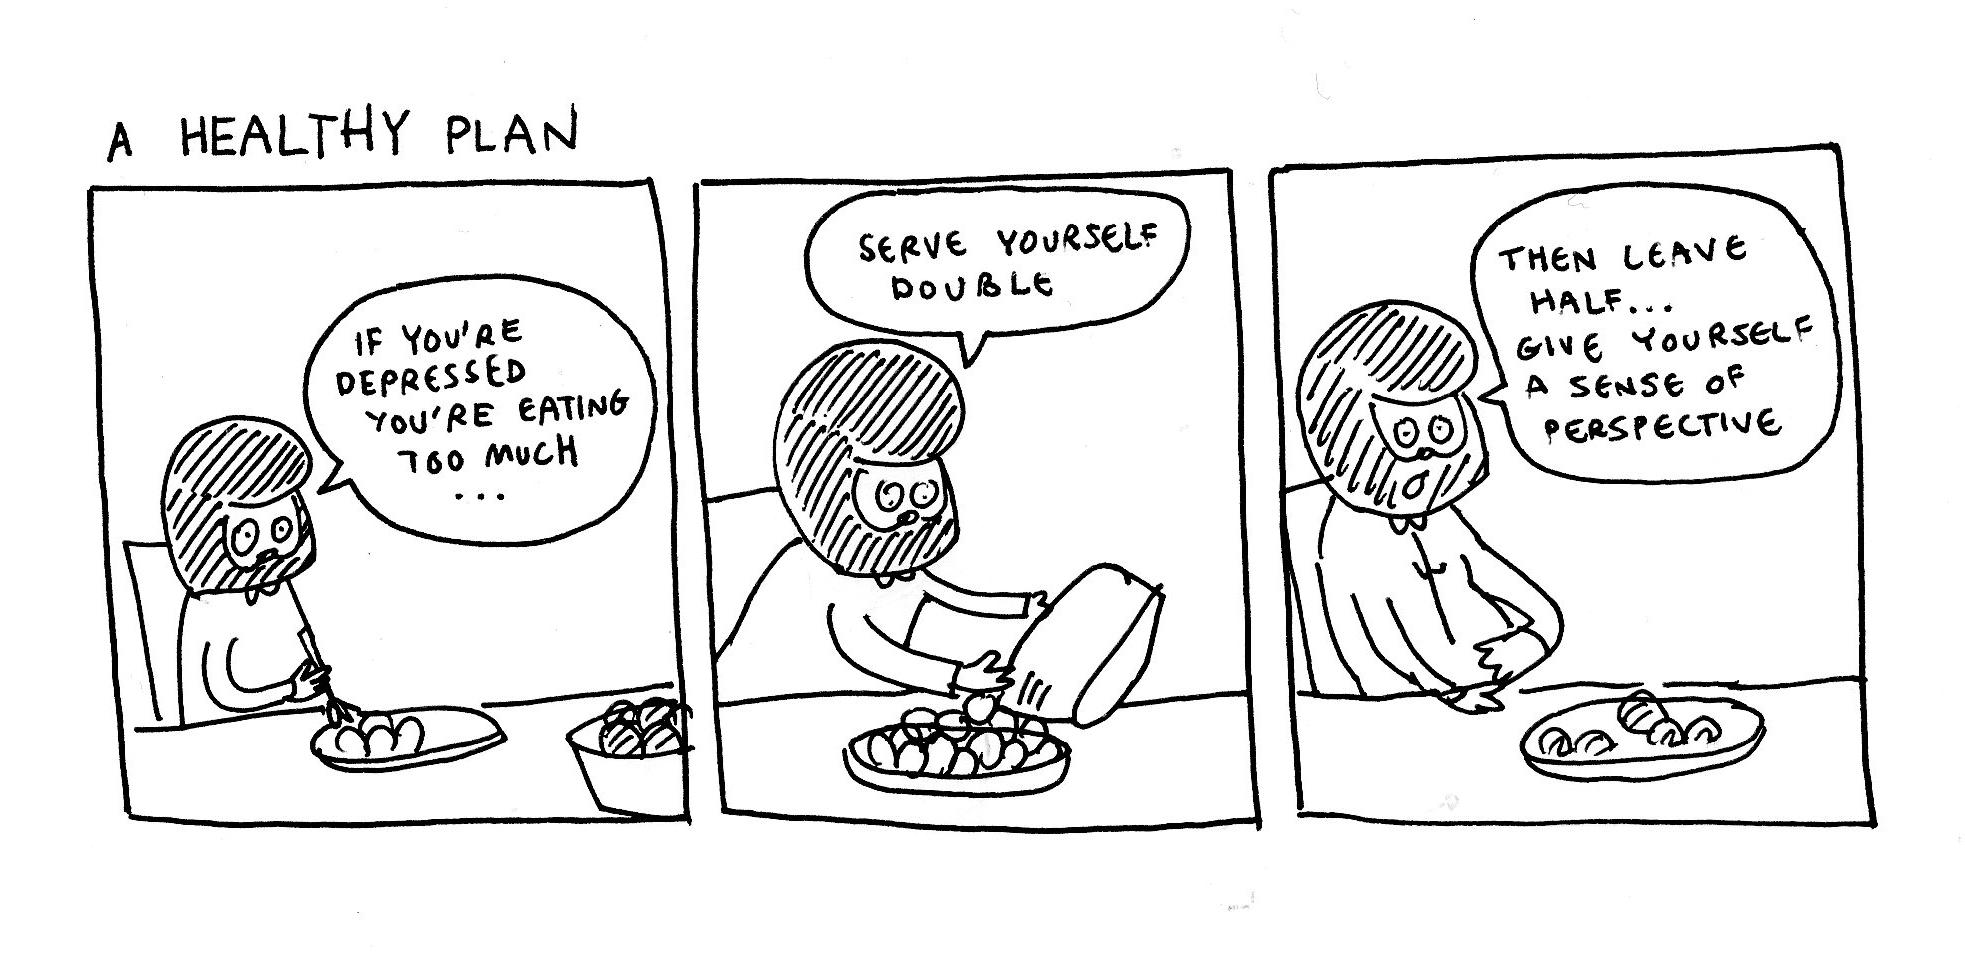 A Healthy Plan